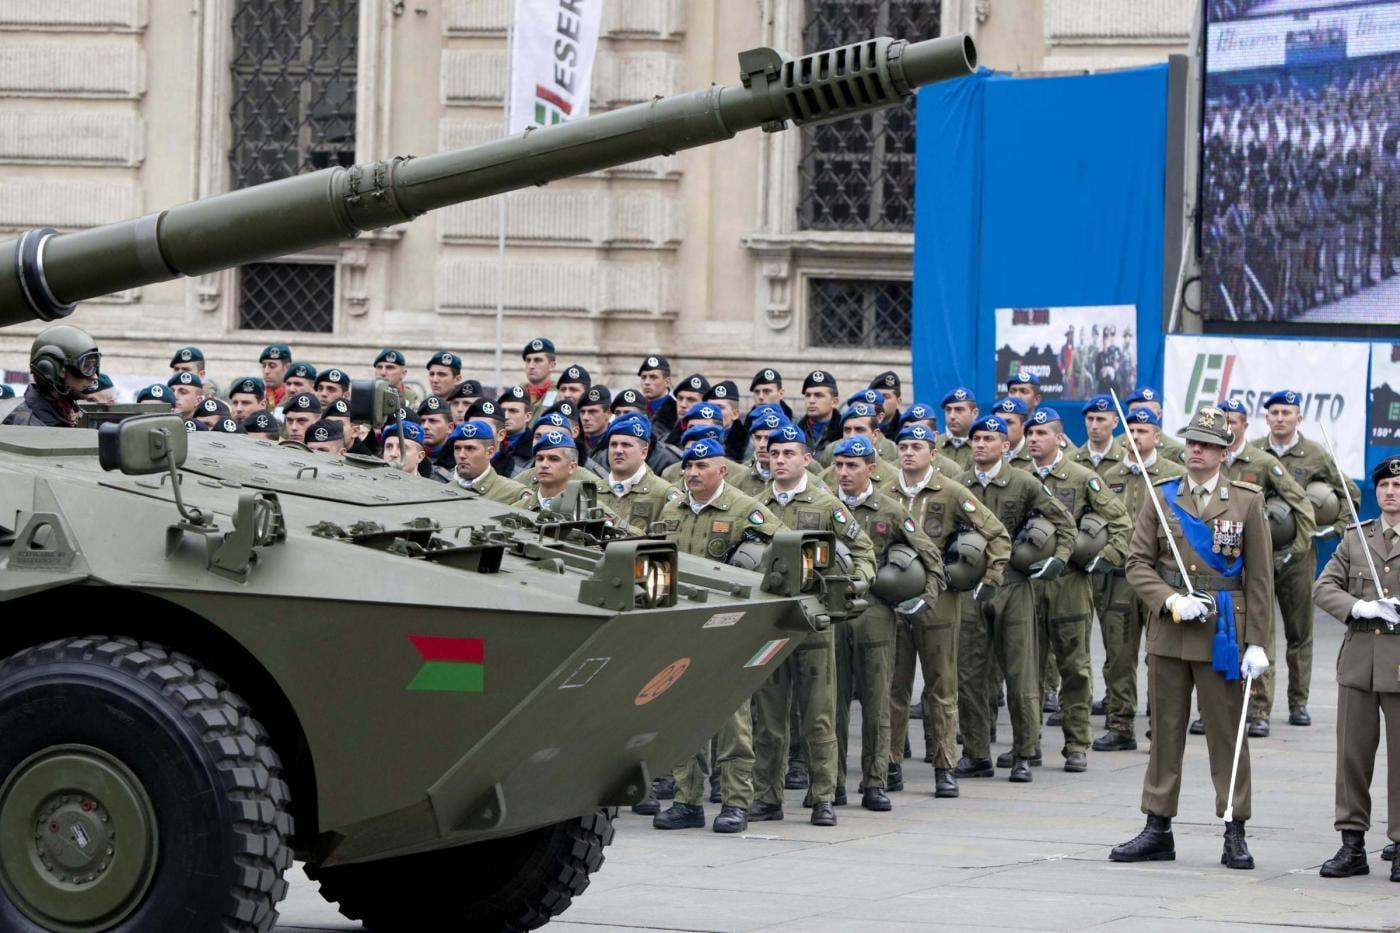 Mafia capitale a ostia emergenza inviate l 39 esercito for Di tommaso arredamenti ostia